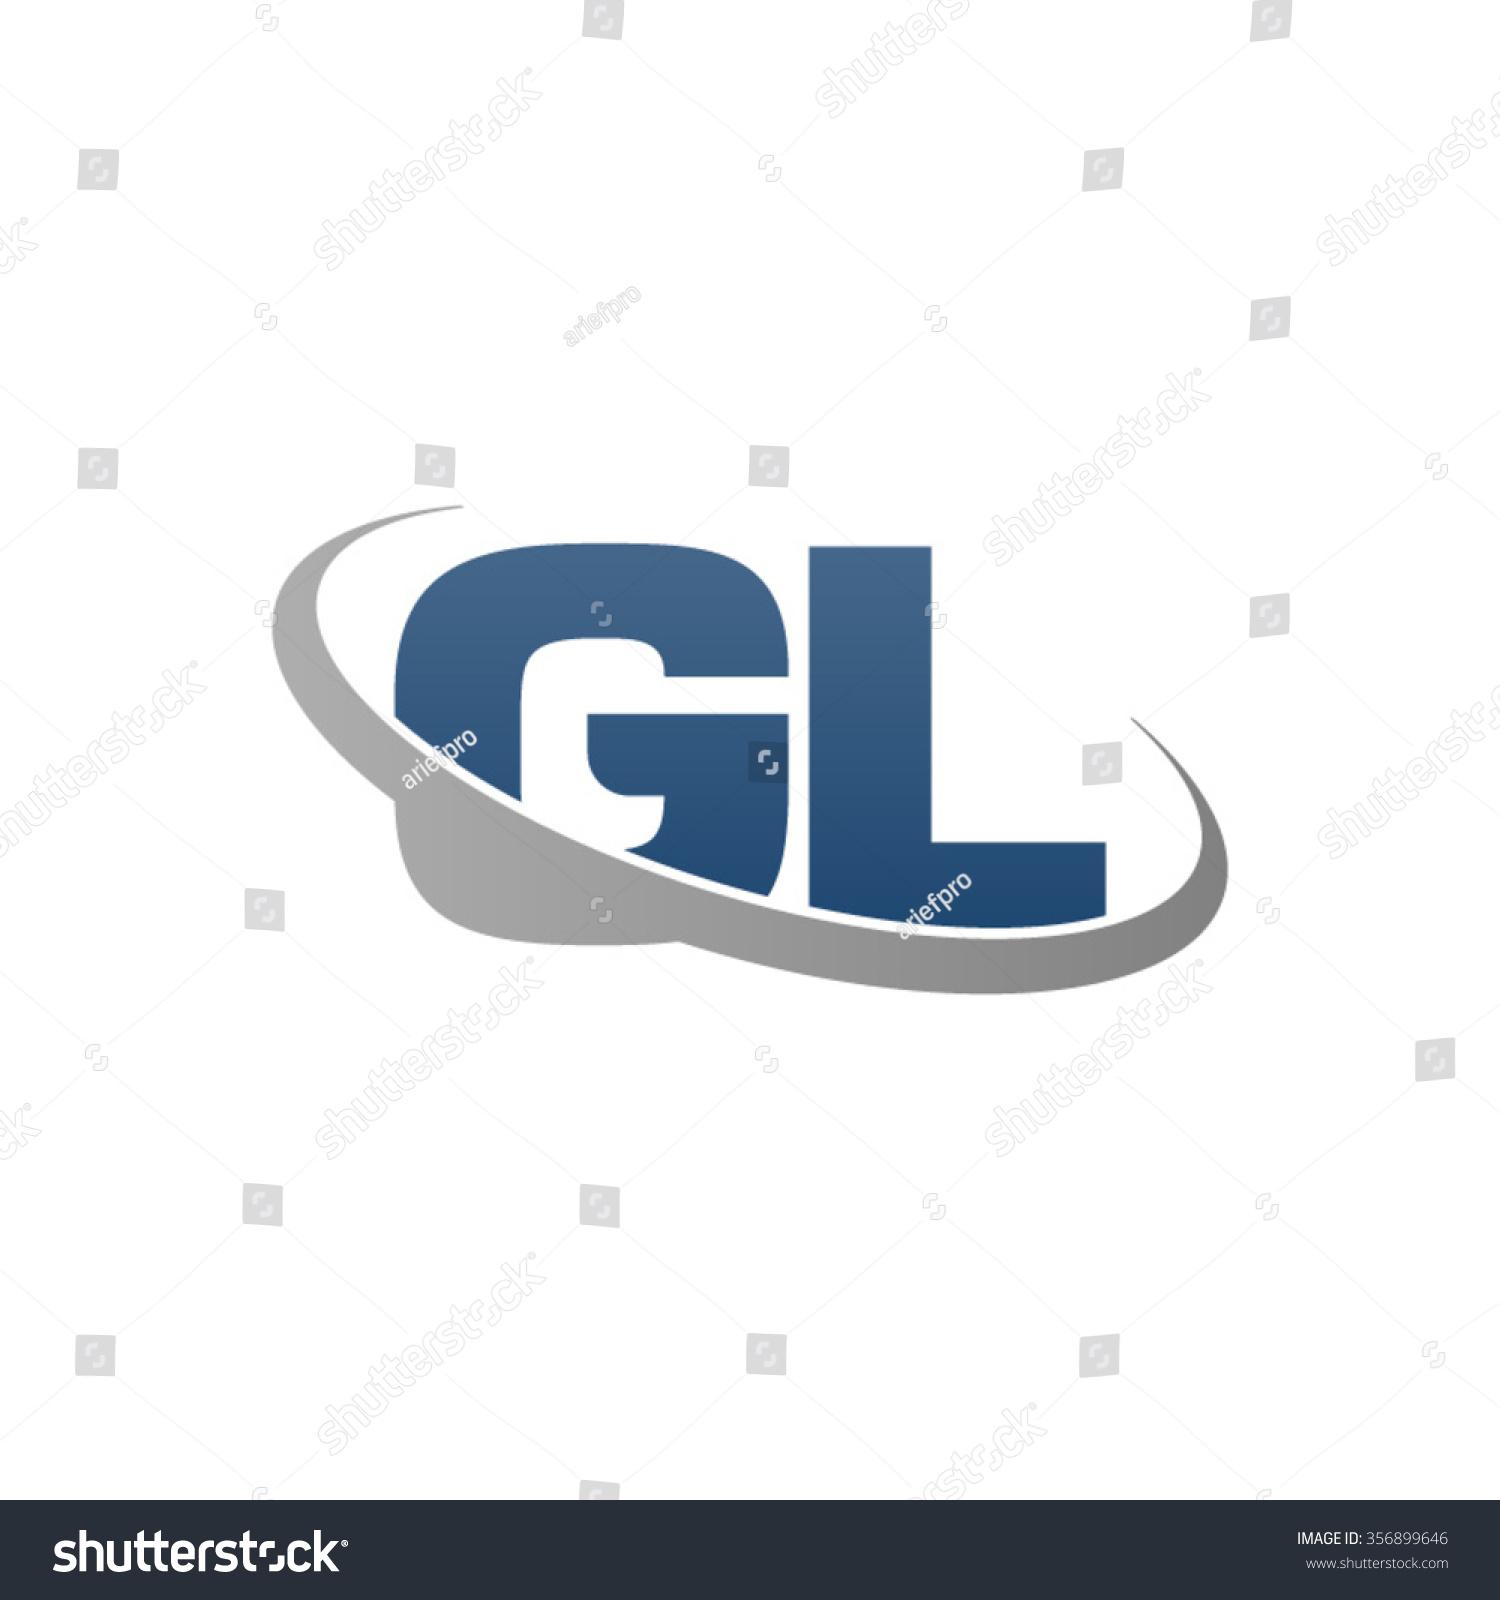 Tj initial luxury ornament monogram logo stock vector - Initial Letter Gl Swoosh Ring Company Logo Blue Gray